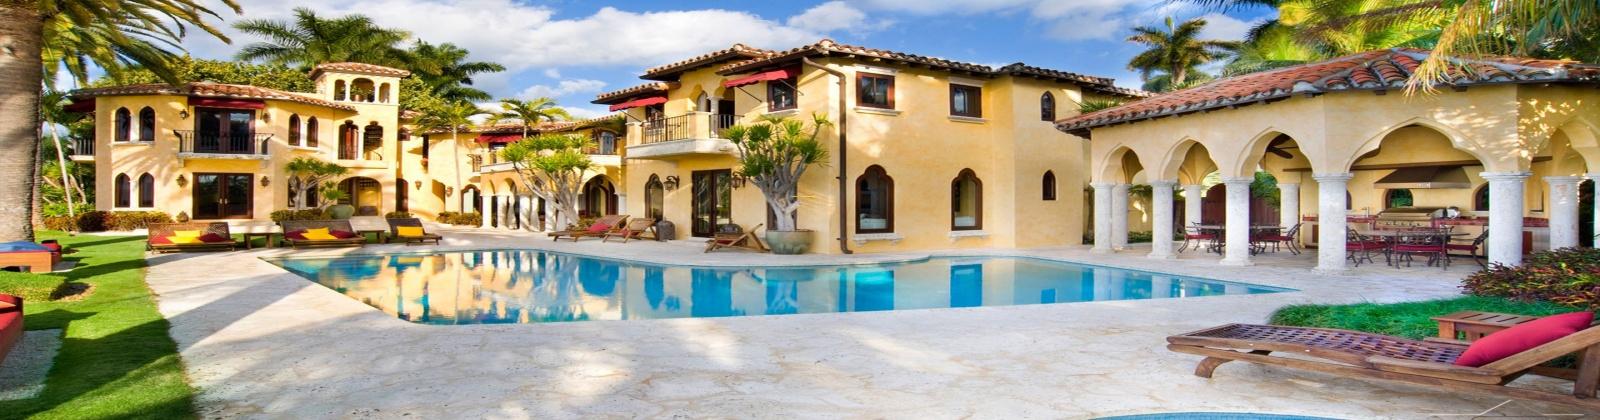 849 Sera Canyon West,Murcia,Nebraska,3 Bedrooms Bedrooms,2 Rooms Rooms,6 BathroomsBathrooms,Office,1012